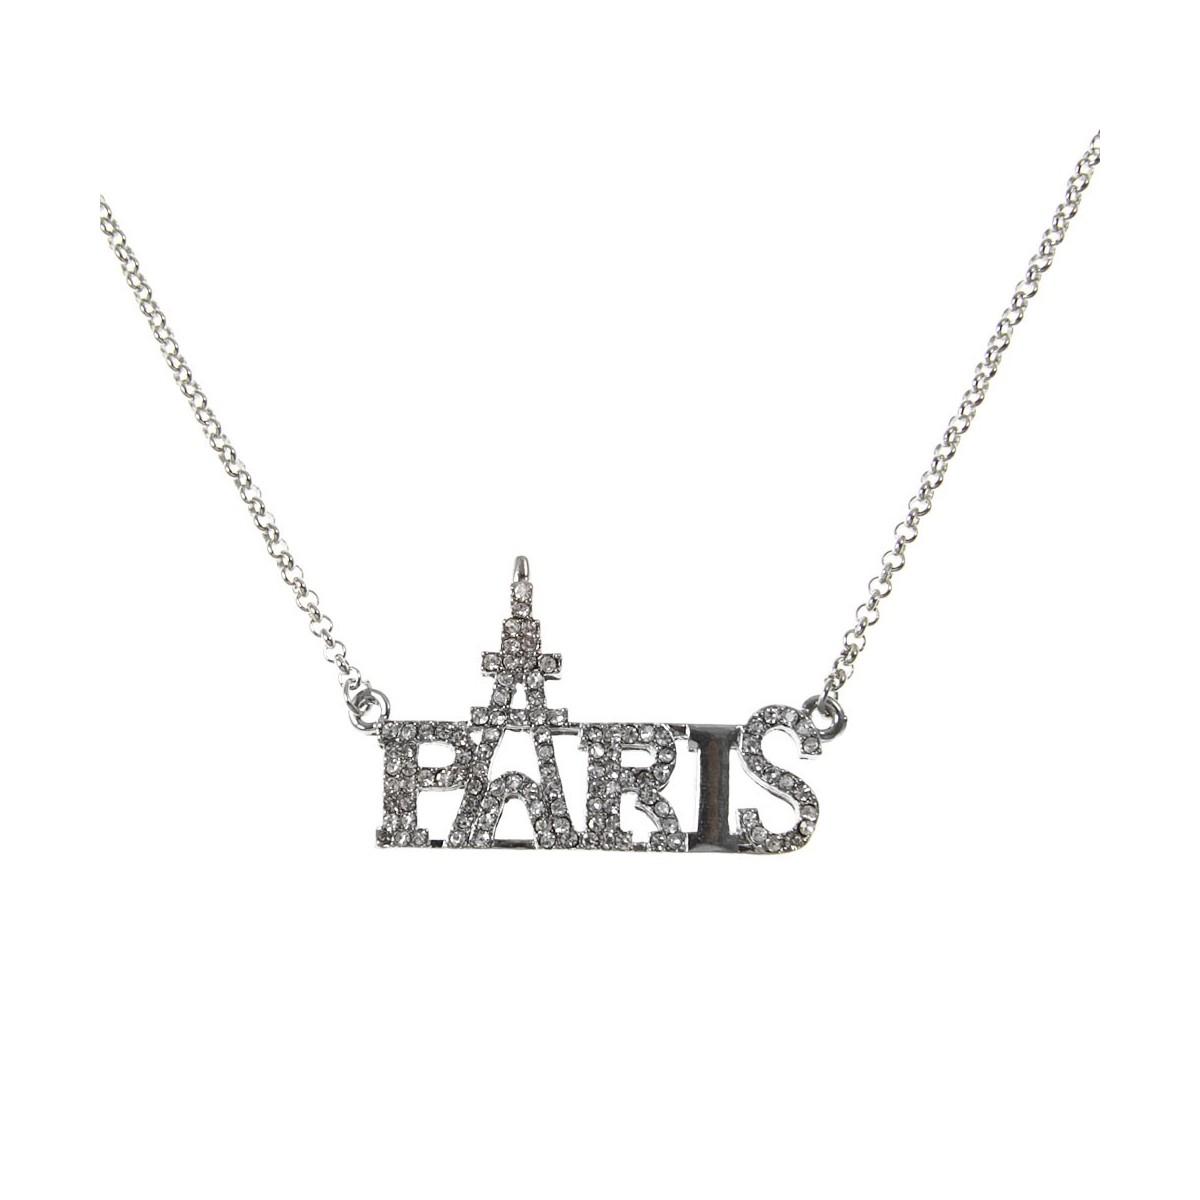 Collier fin Paris strass